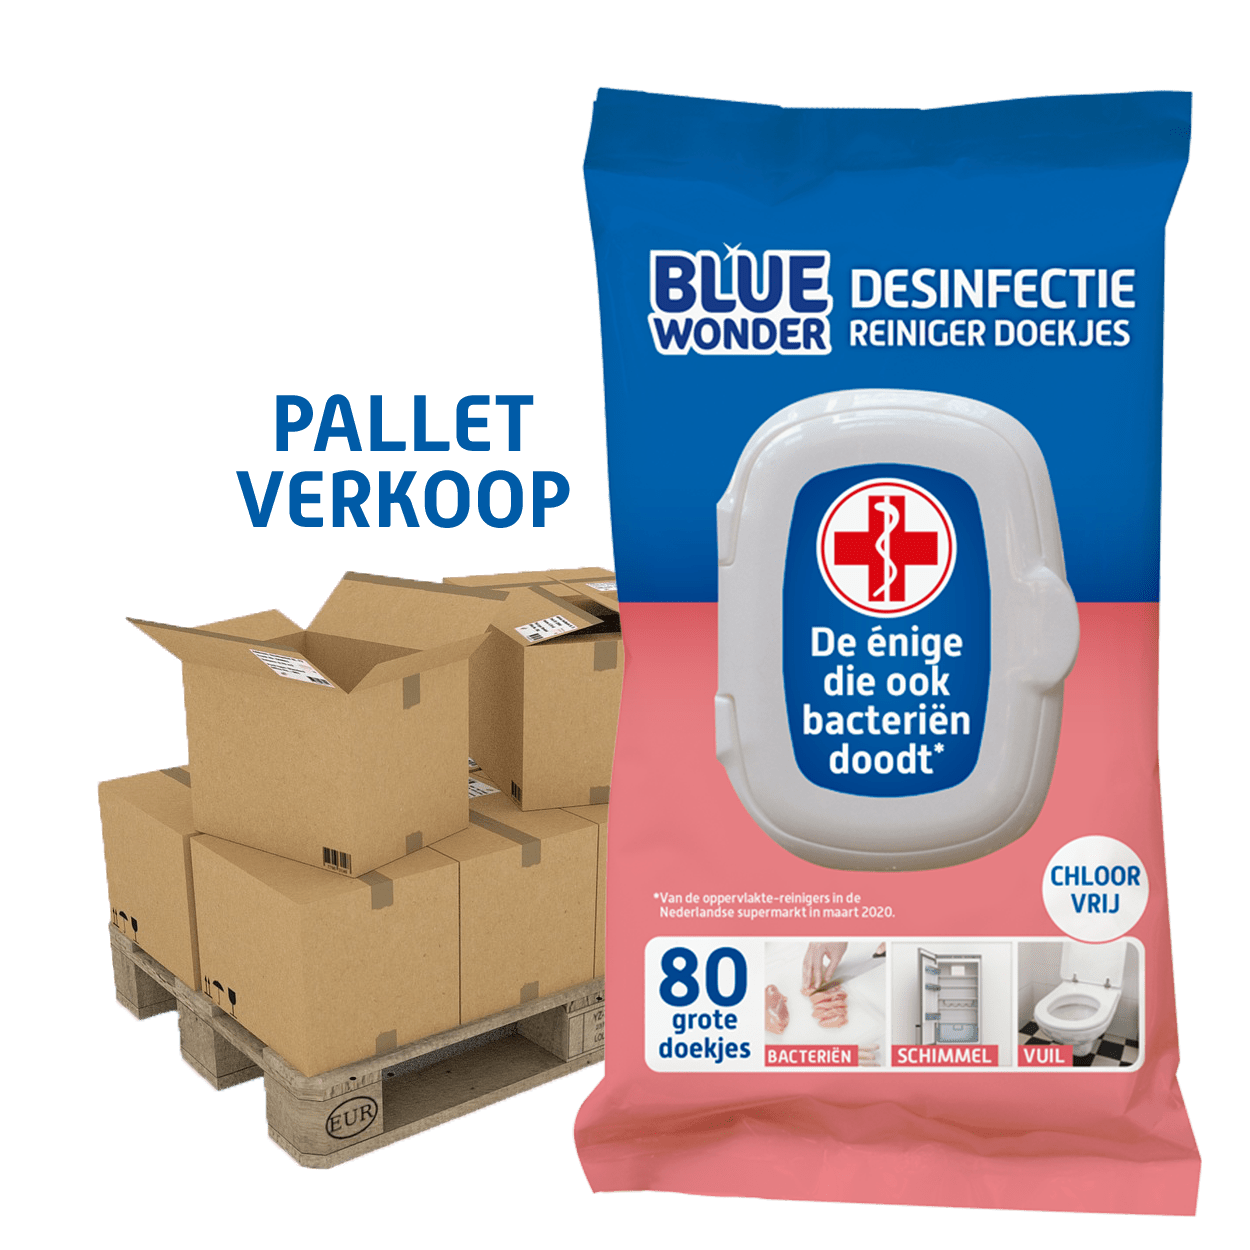 8712038001707 Blue Wonder Desinfectie reiniger doekjes 80stuks PALLET 2